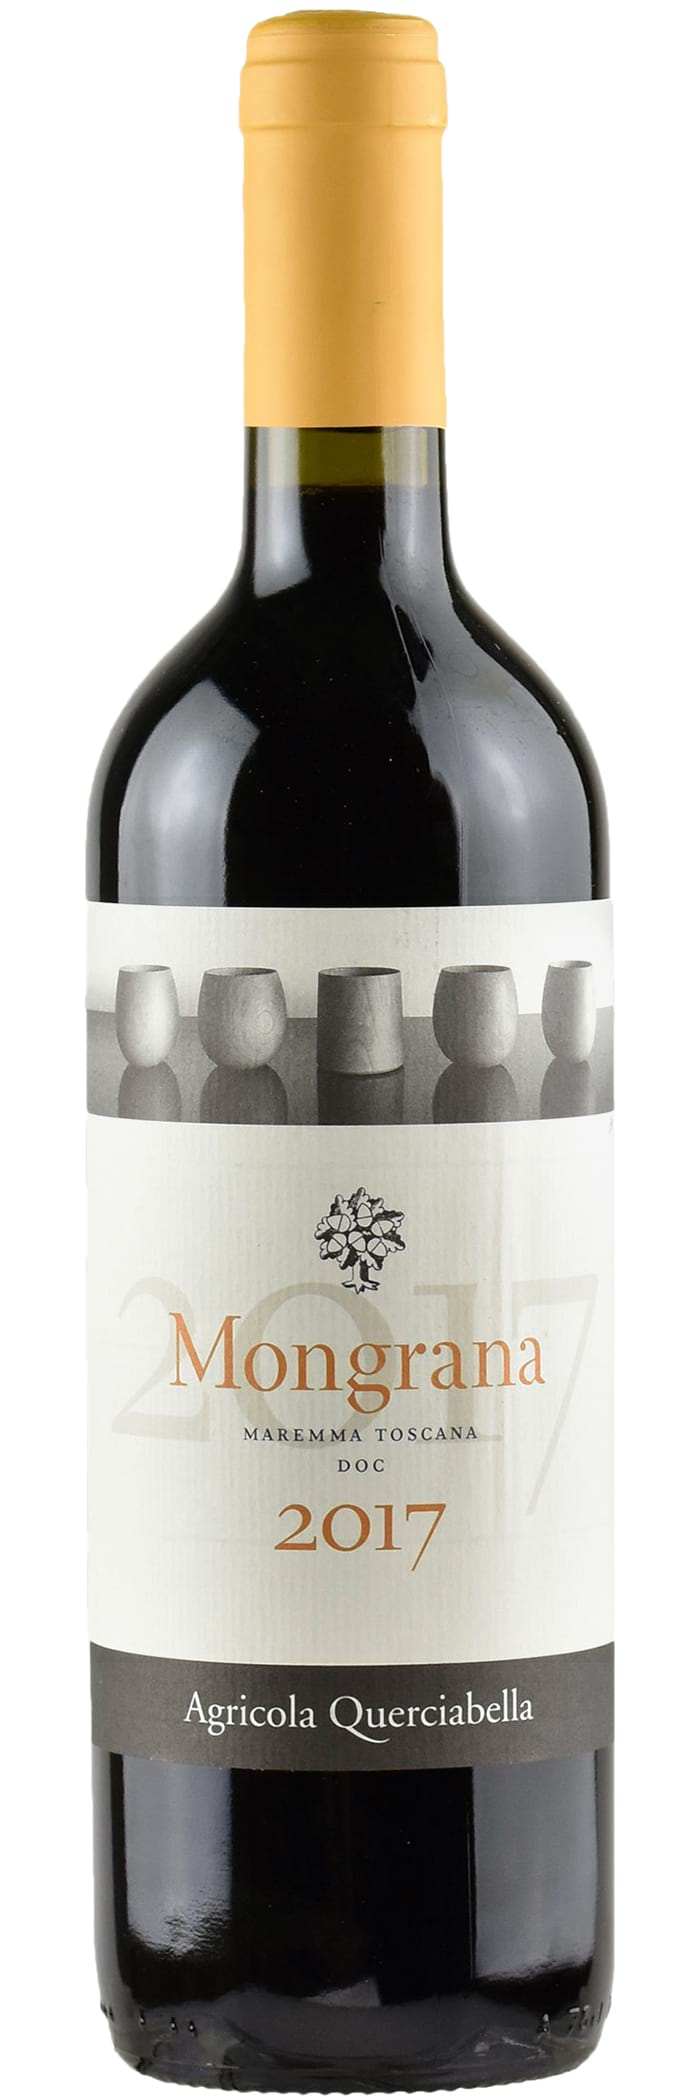 2017 Agricola Querciabella Mongrana Maremma Toscana фото